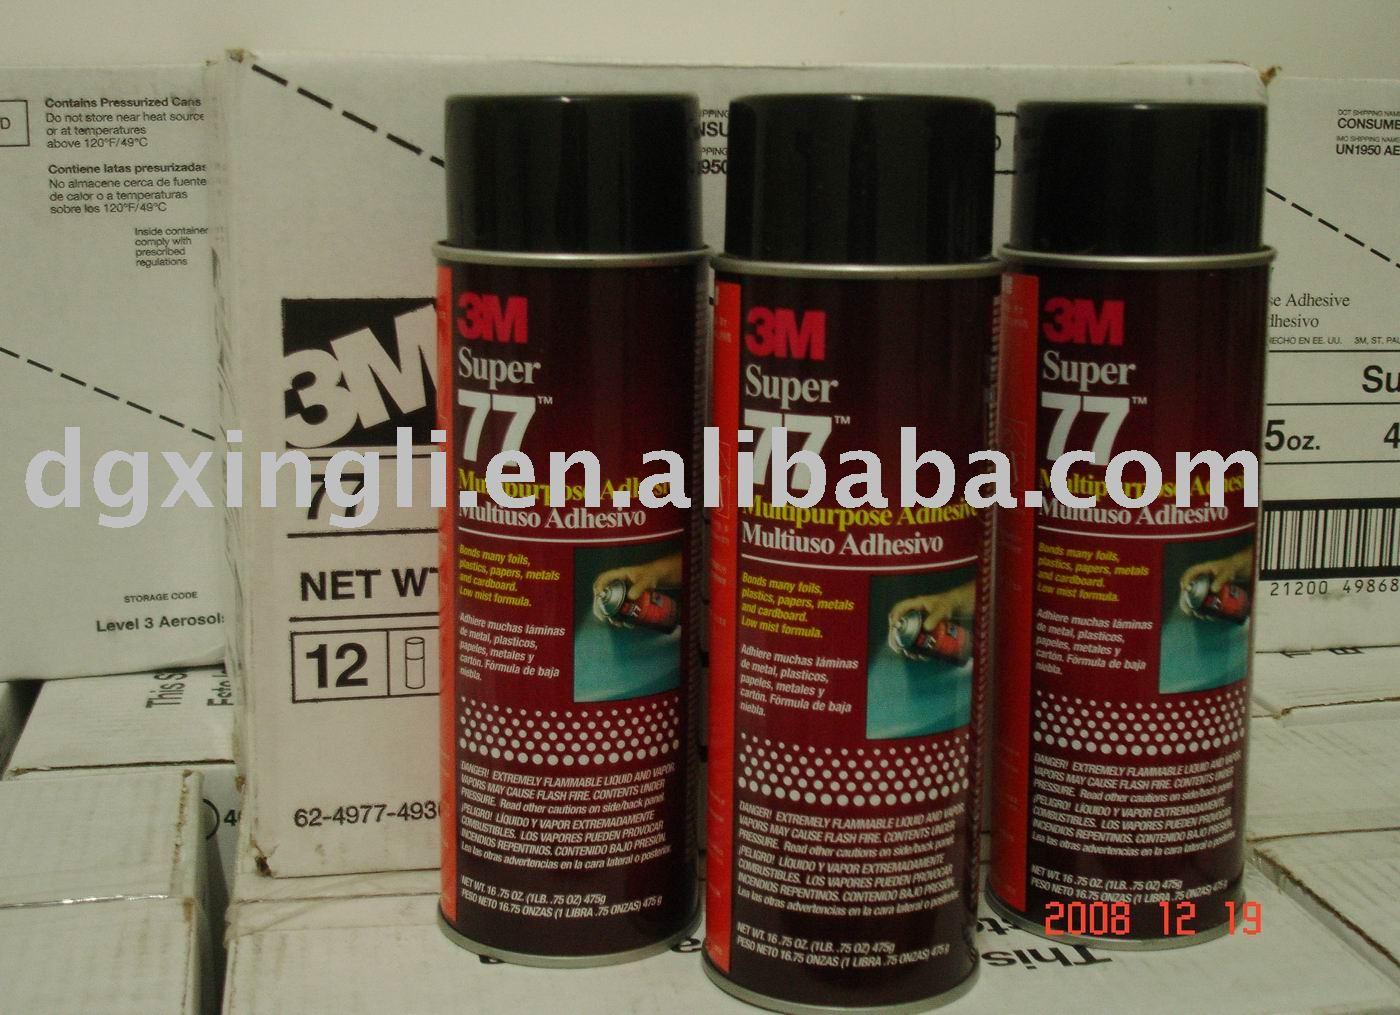 spray adhesive | eBay